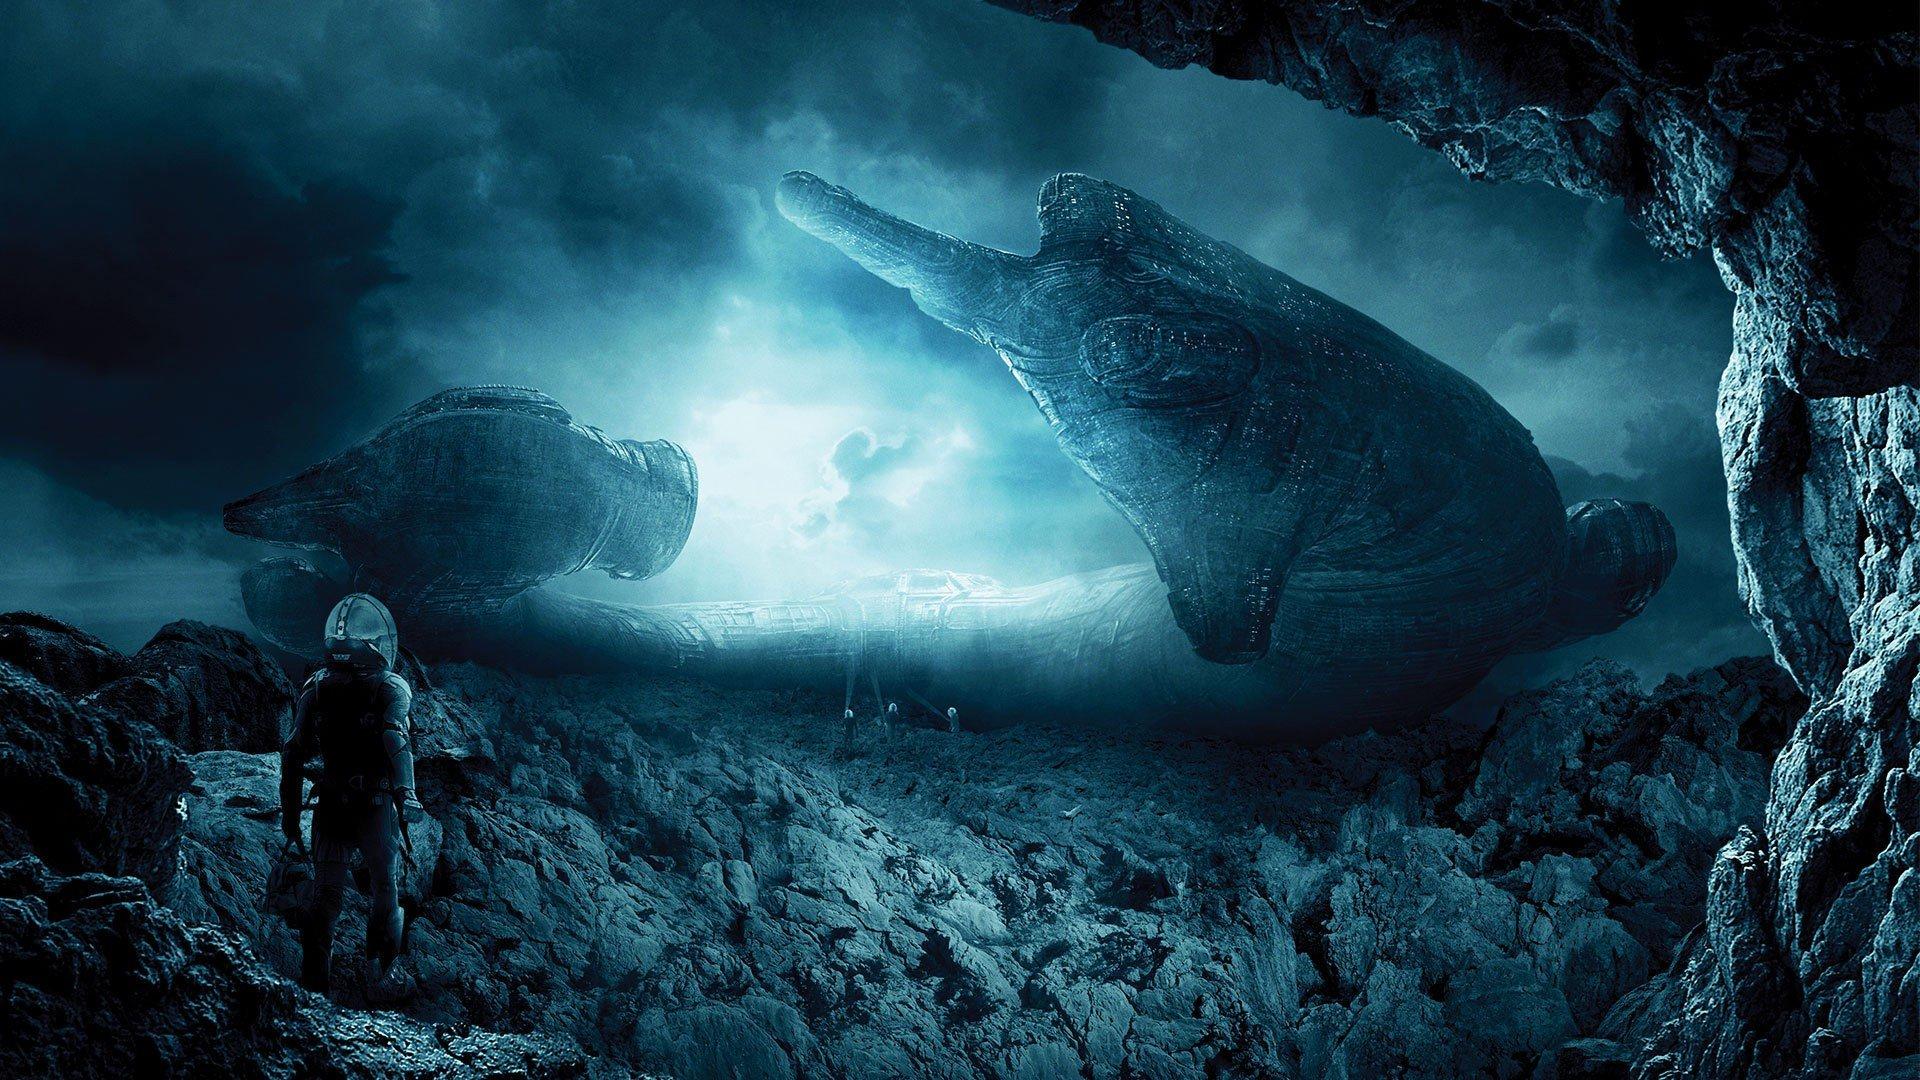 landscape Digital Art Prometheus movie Spaceship 1920x1080